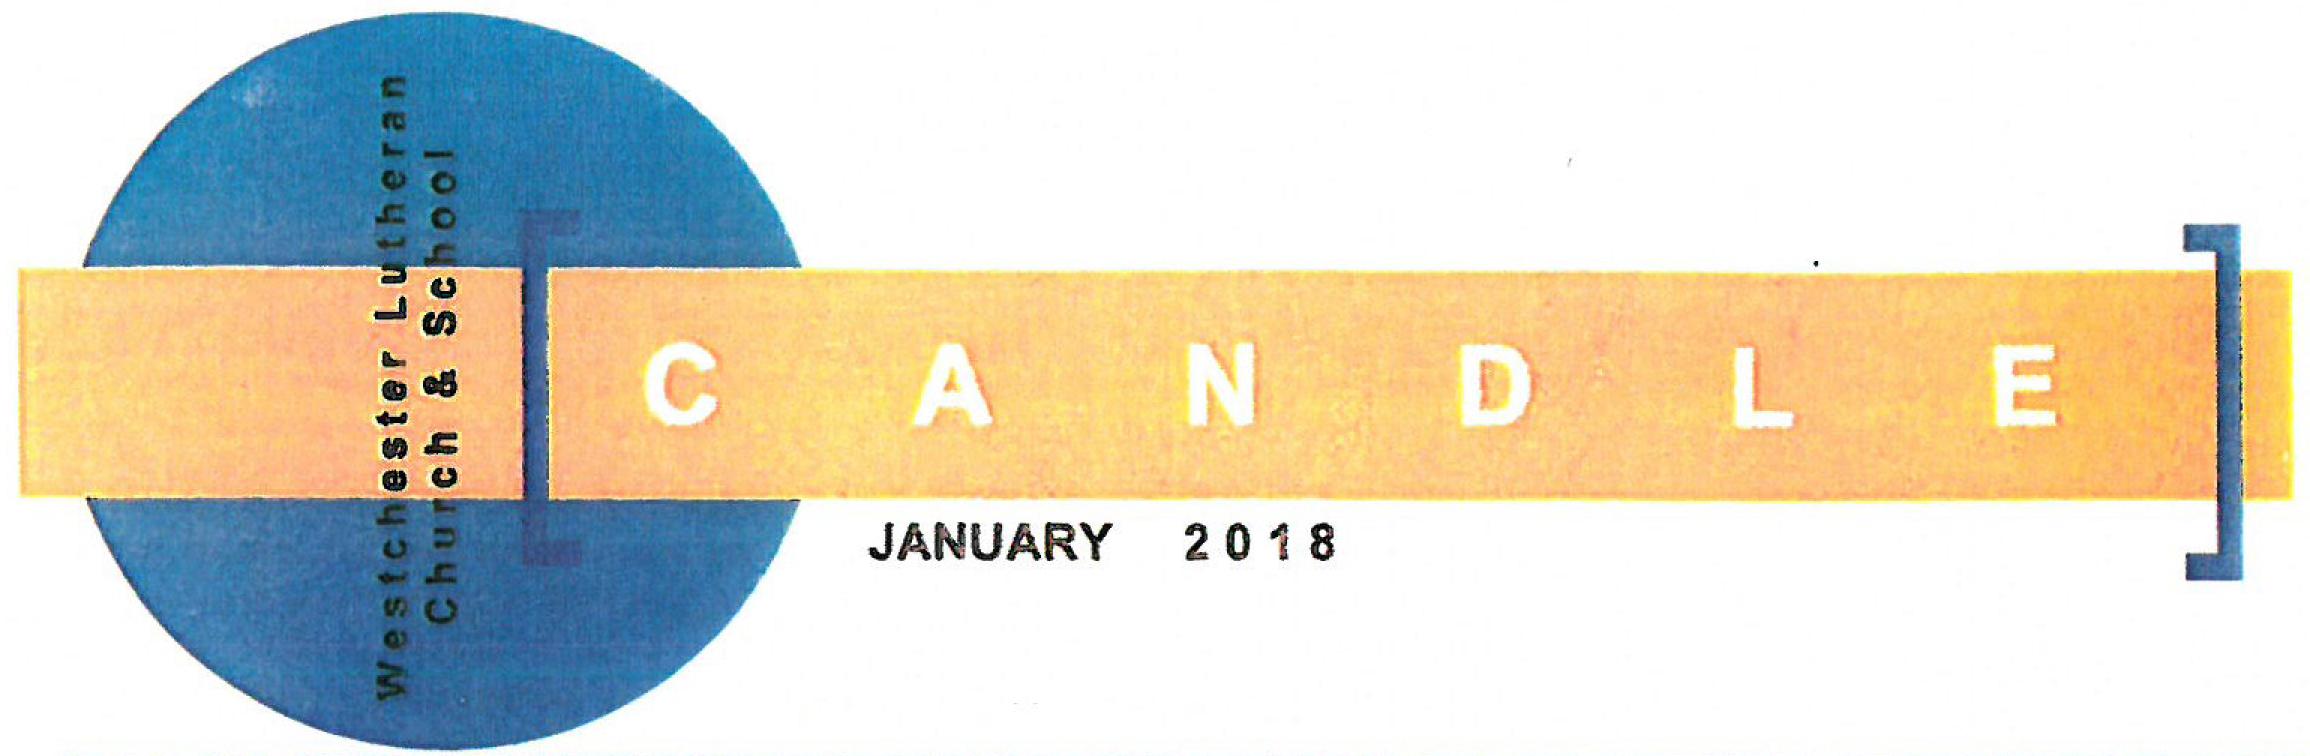 2018 January Candle.jpg